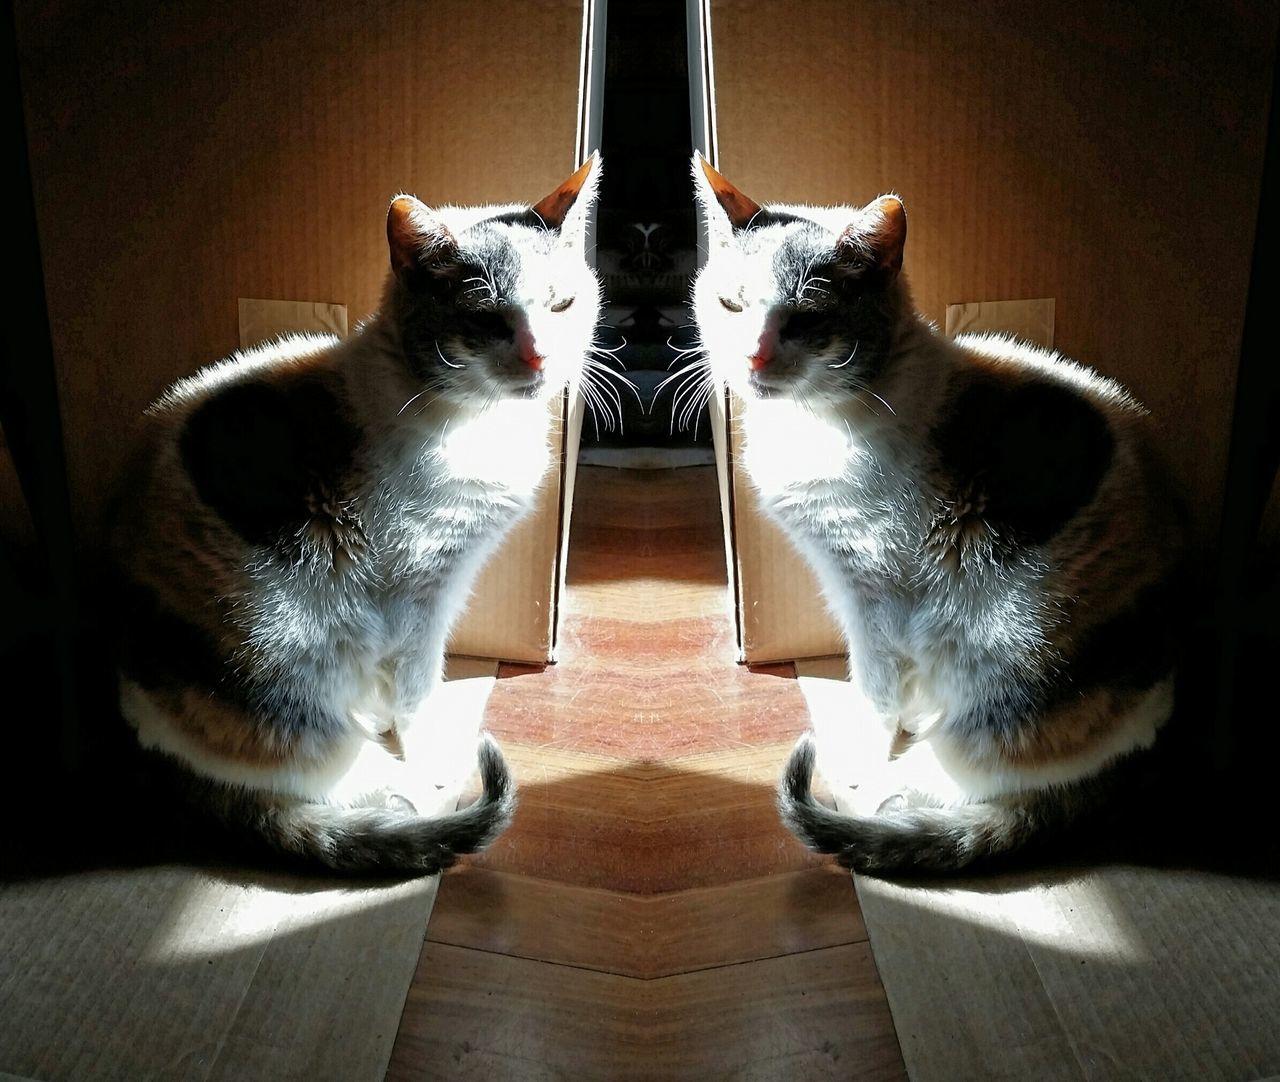 indoors, domestic cat, mammal, animal themes, domestic animals, pets, hardwood floor, no people, feline, day